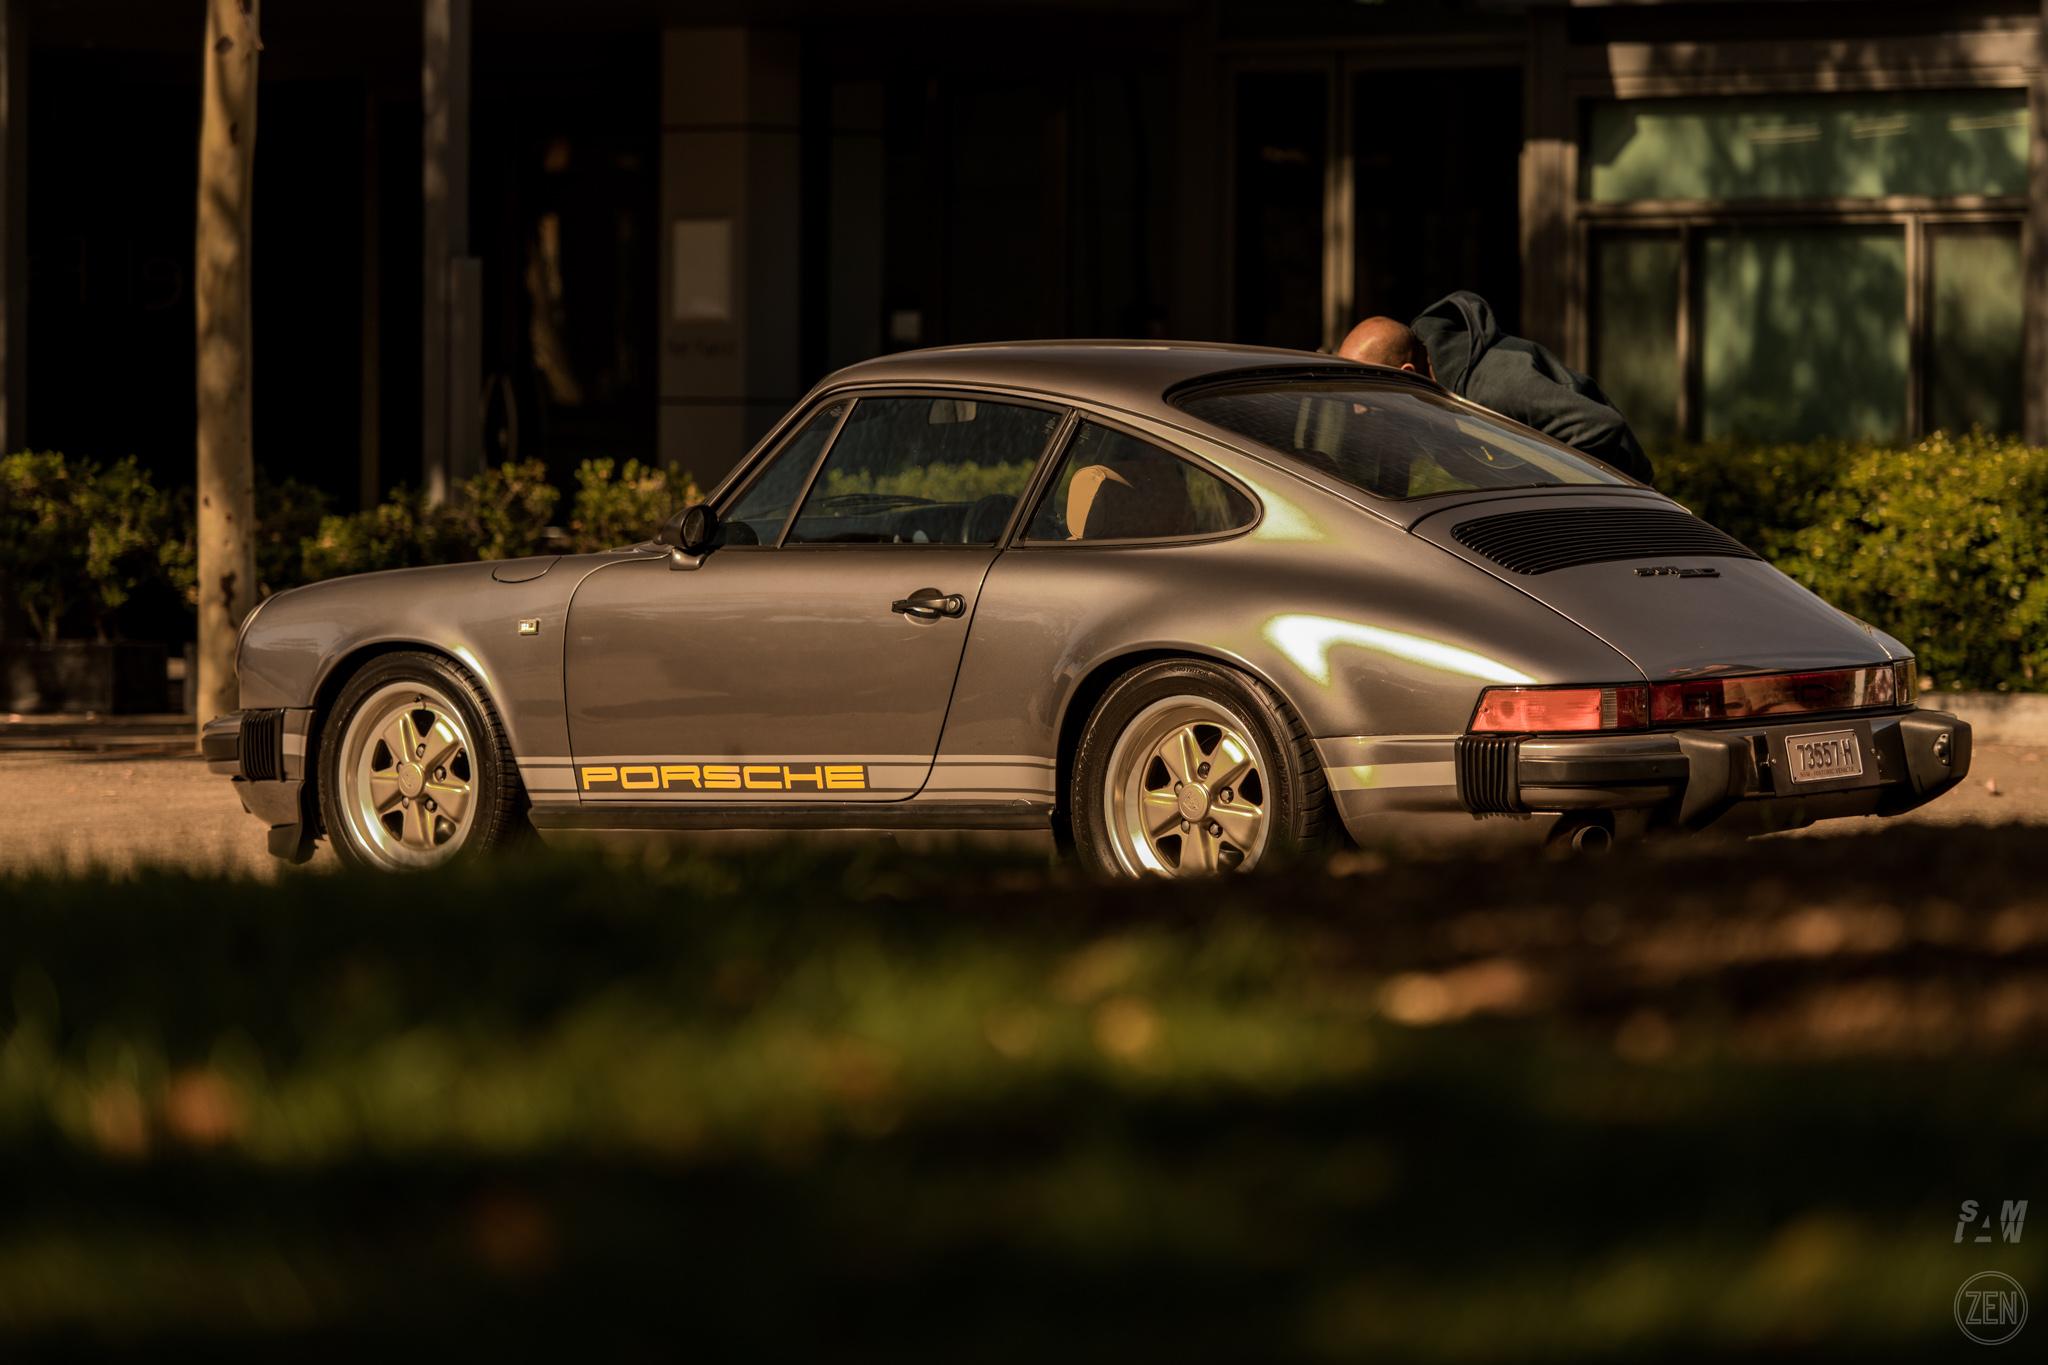 2019-10-27 - Autohaus Porsches & Coffee 156